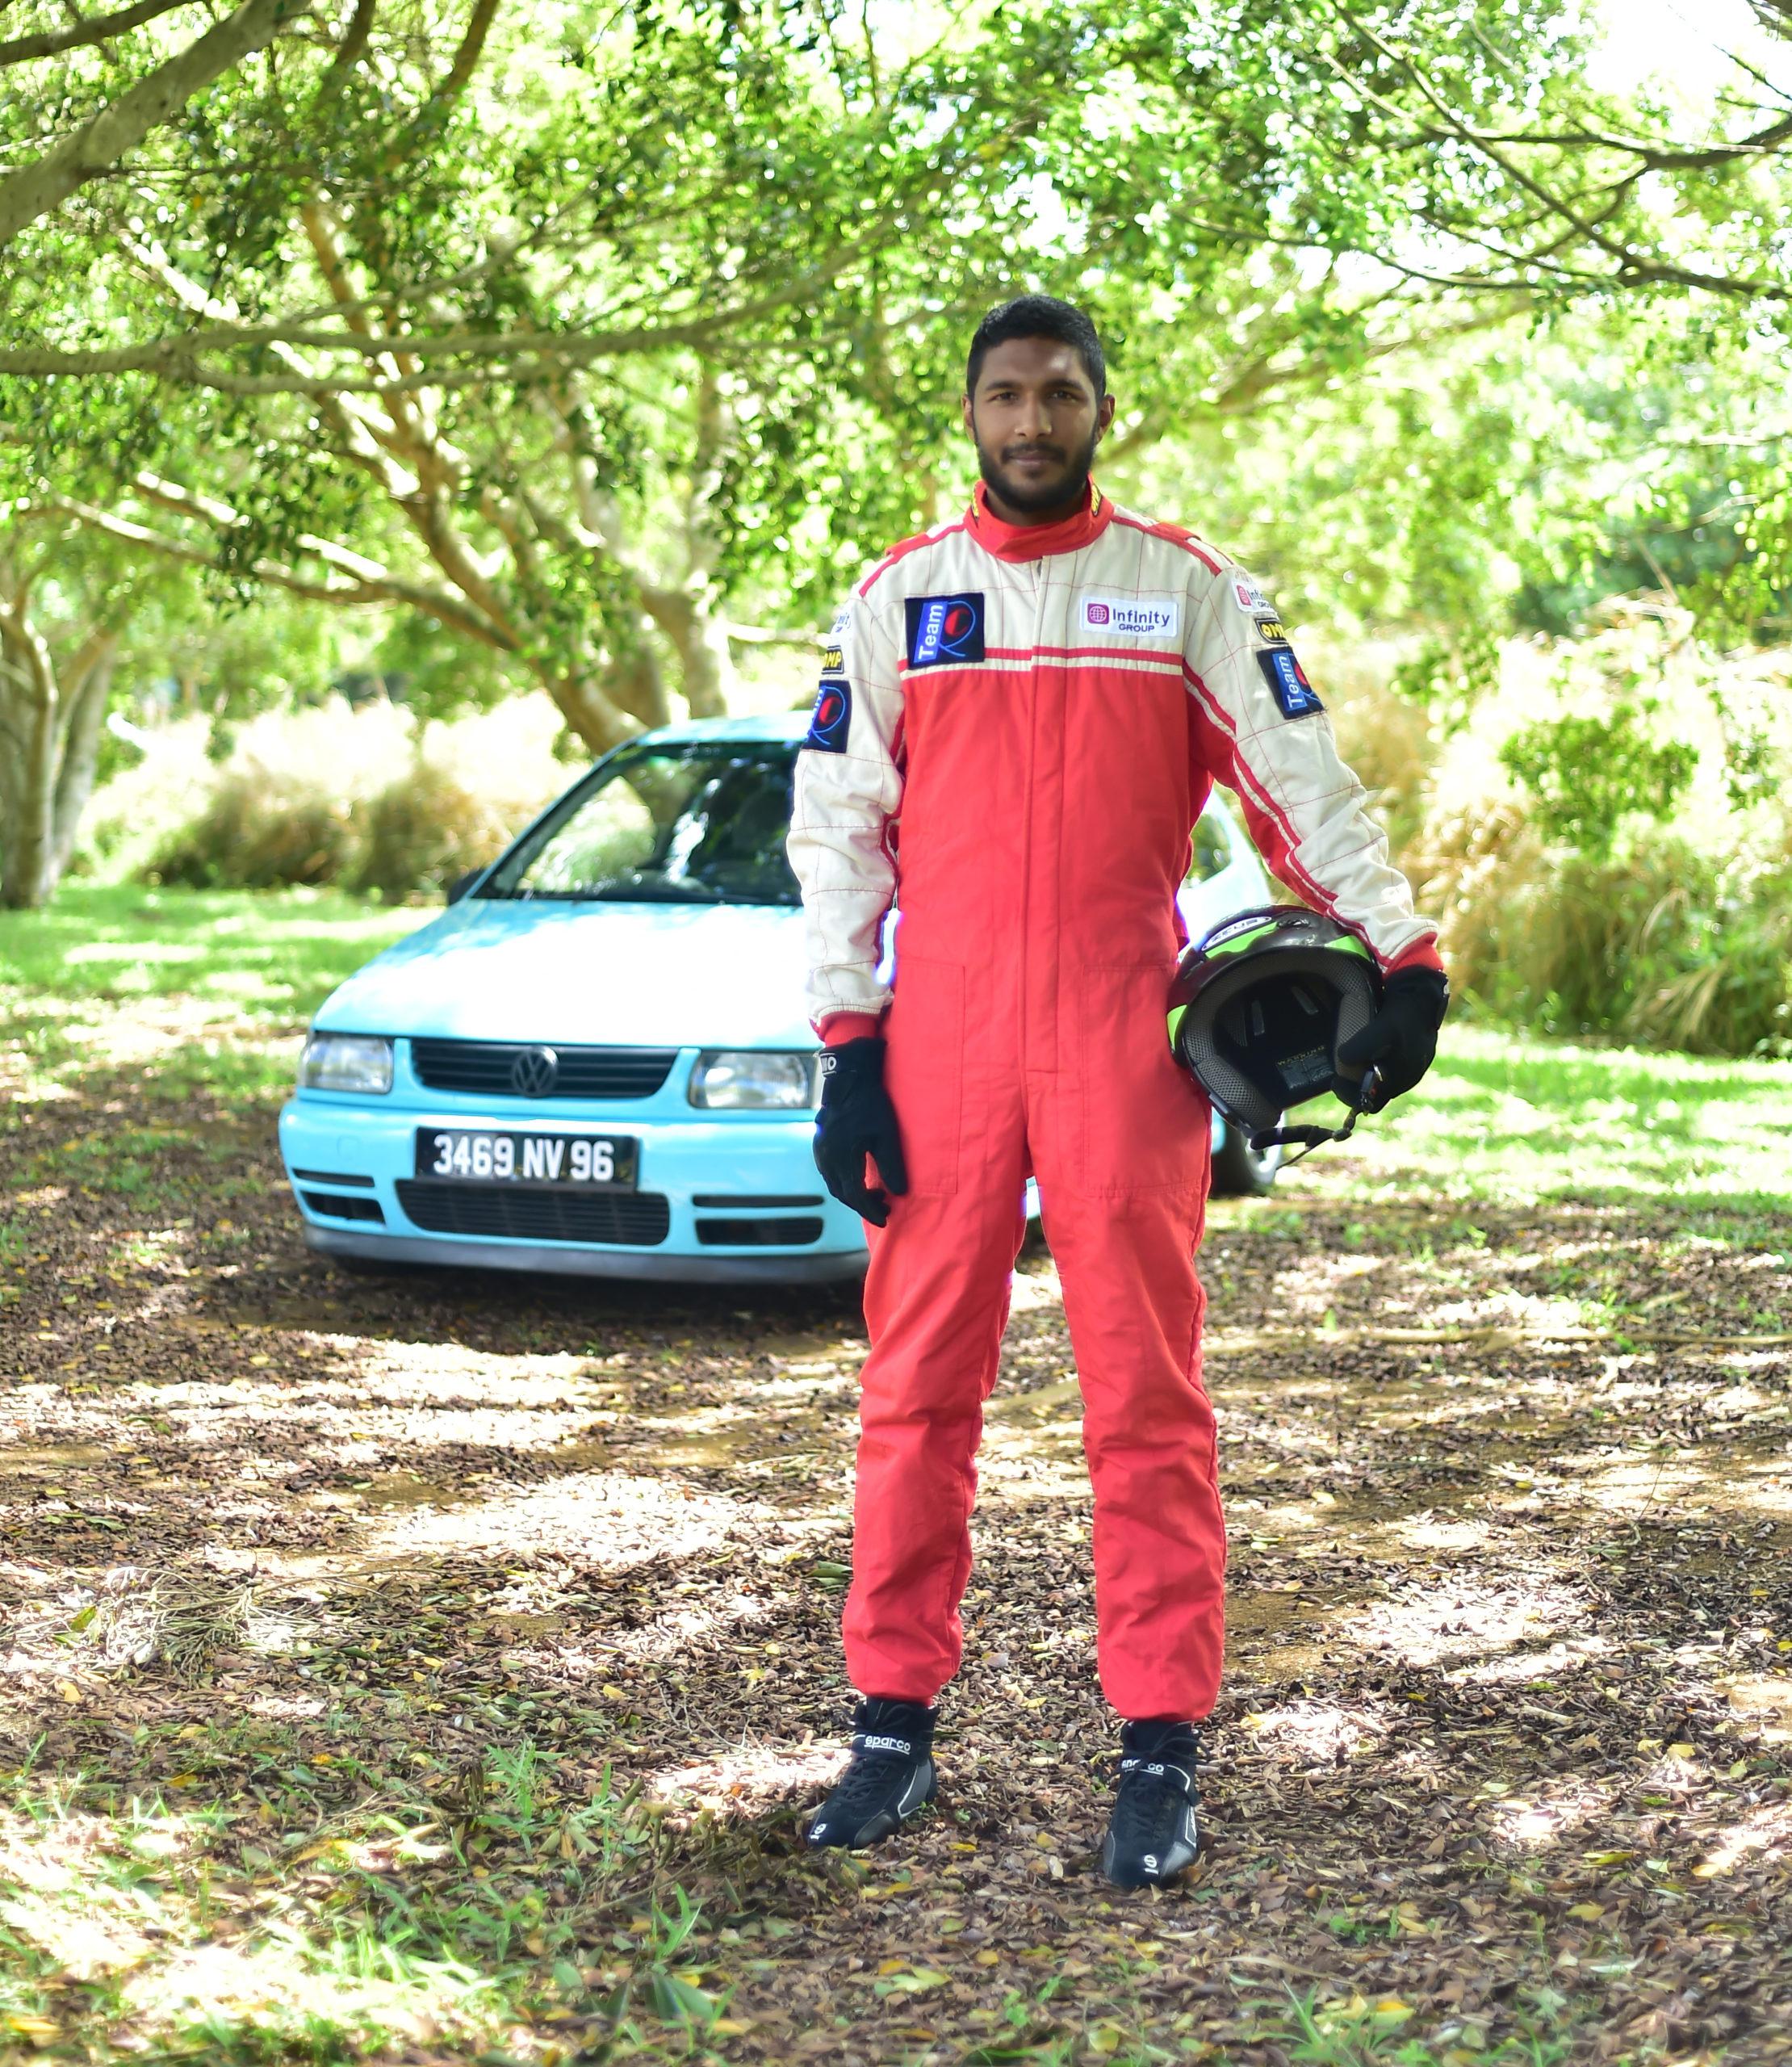 Nikhil Baggonauth - Le pilote aux forces G   business-magazine.mu